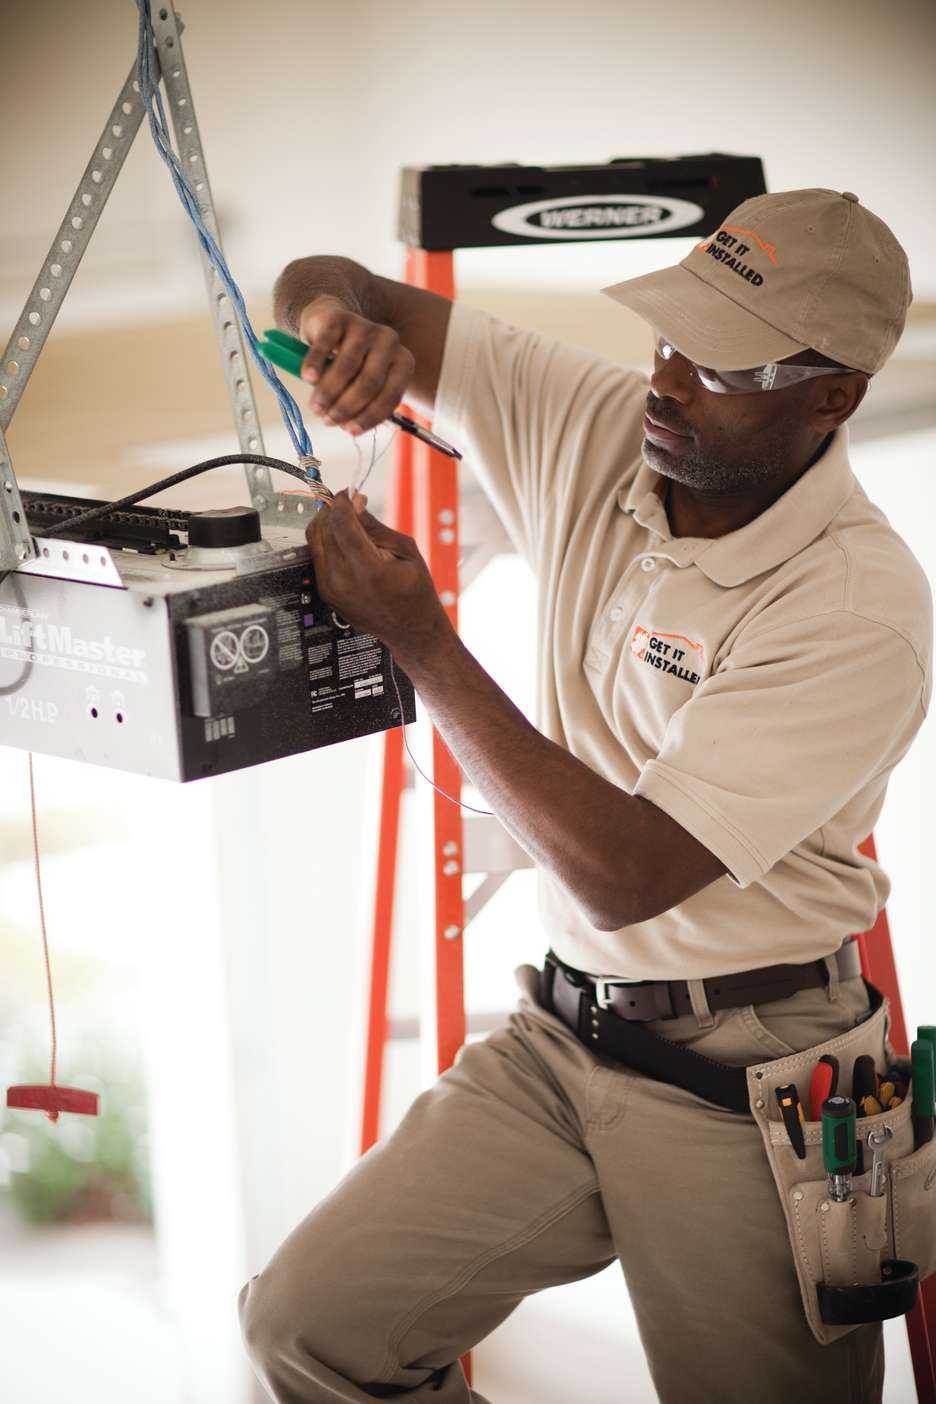 Home Services at The Home Depot - painter  | Photo 8 of 10 | Address: 1551 Dunlawton Blvd, Port Orange, FL 32127, USA | Phone: (386) 361-3452